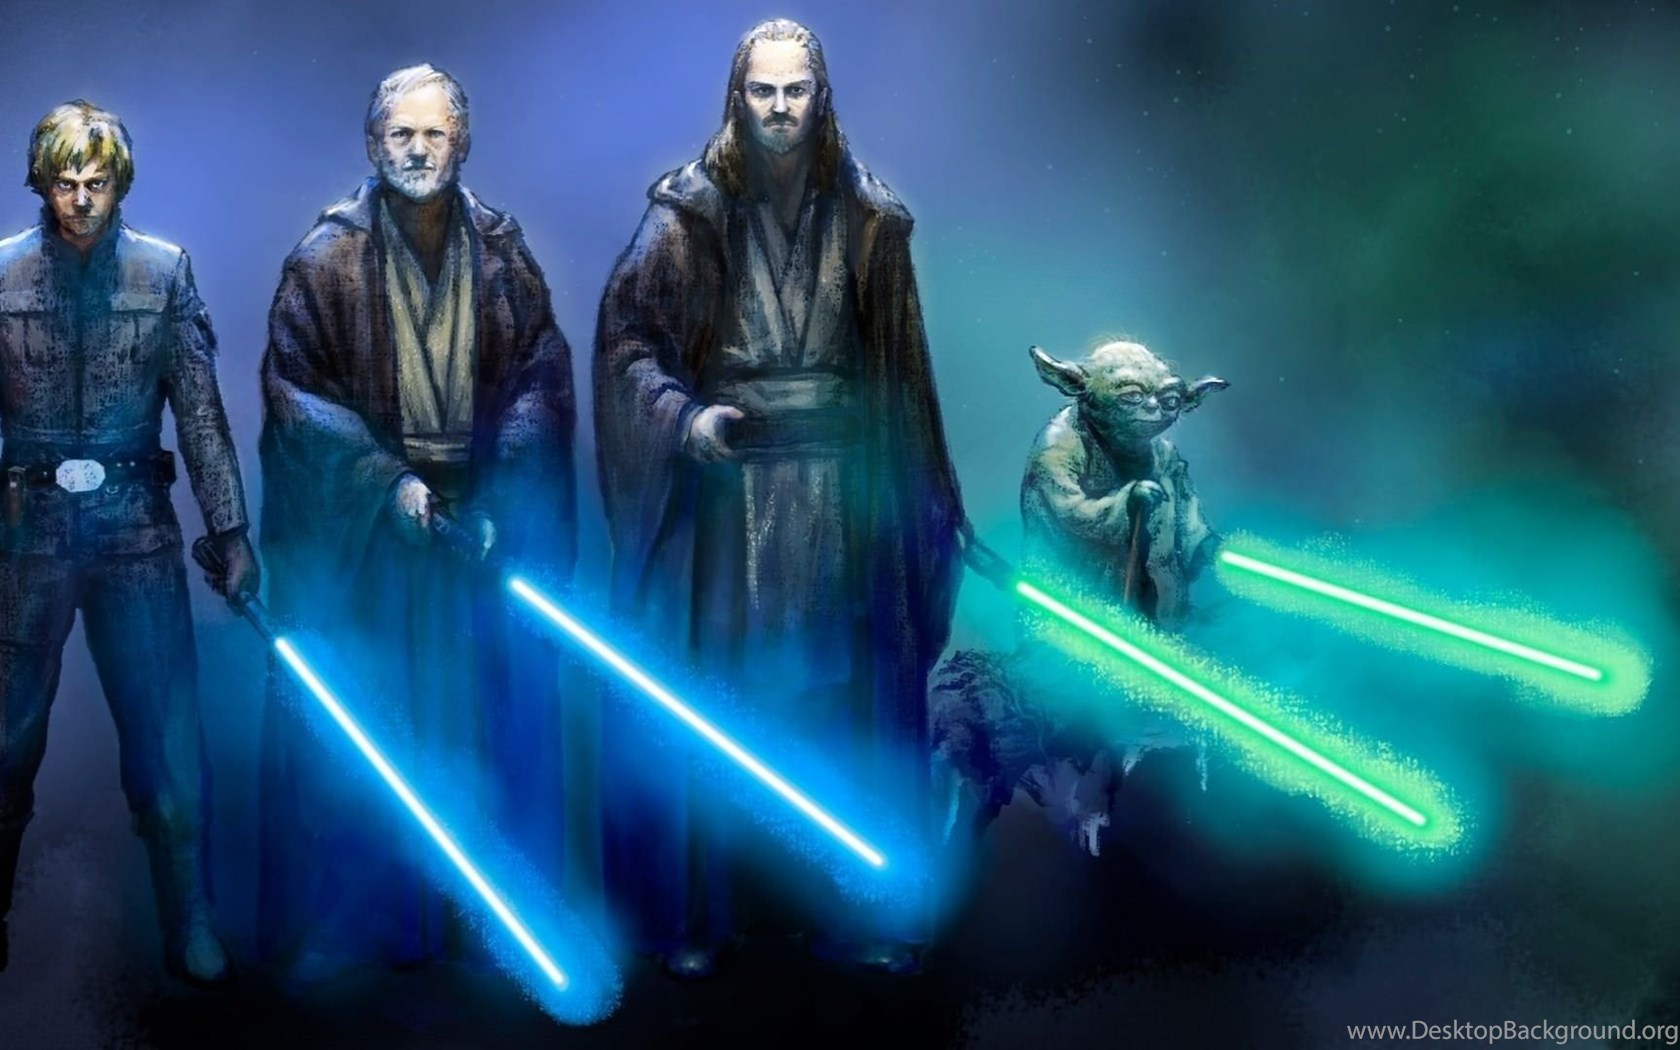 1920x1080 Jedi Star Wars Obi Wan Kenobi Luke Skywalker Qui Gon